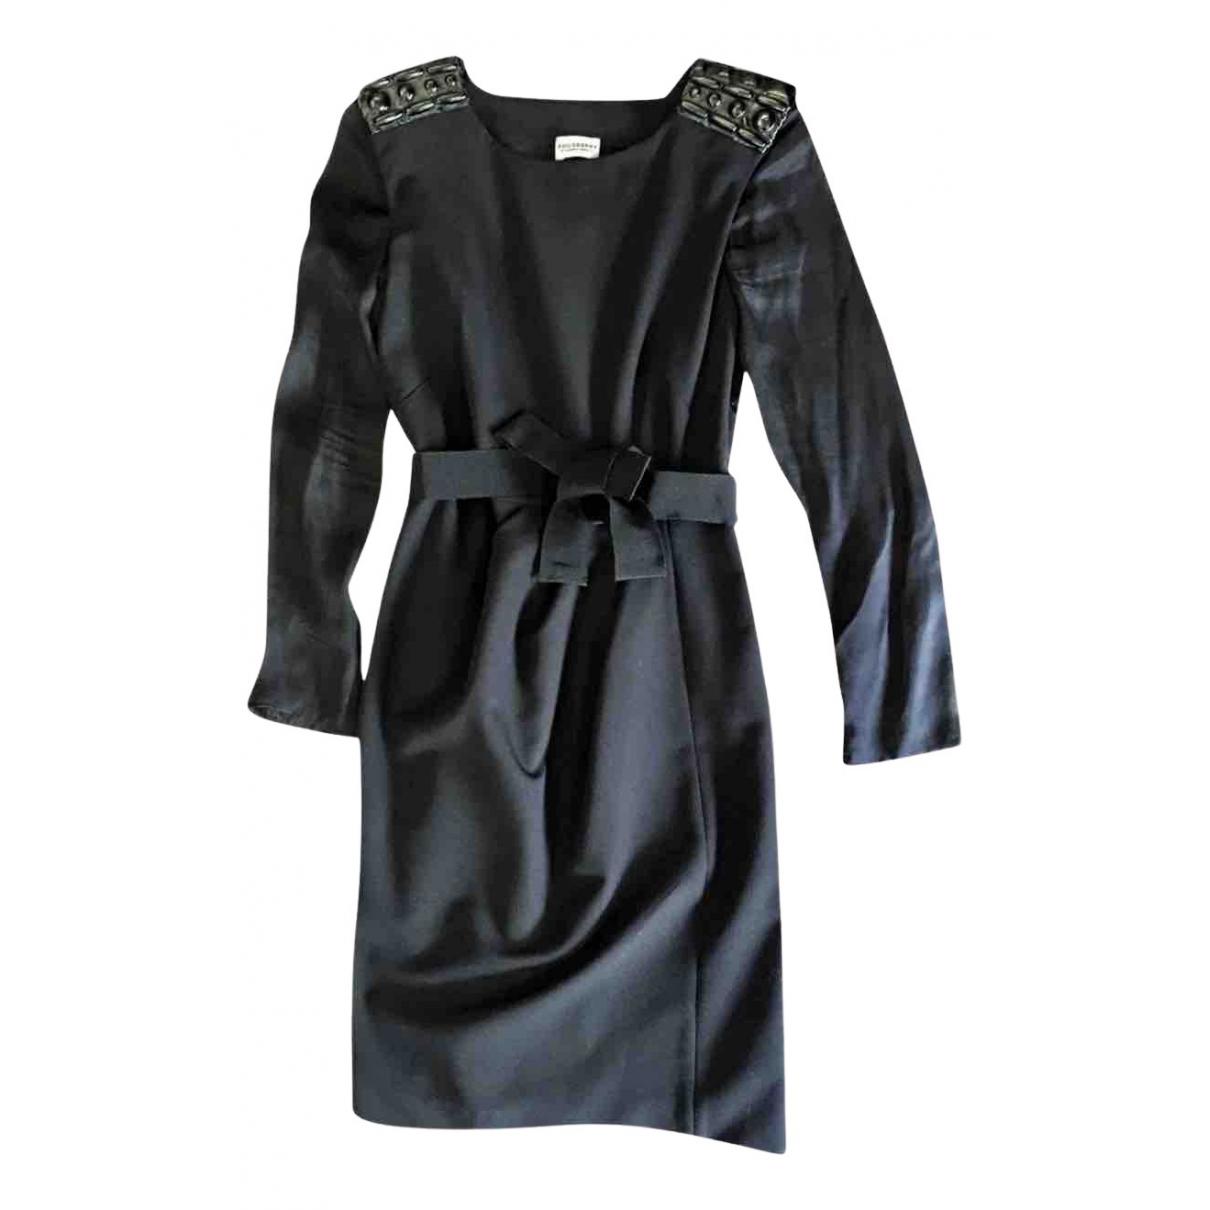 Alberta Ferretti N Black dress for Women 36 FR